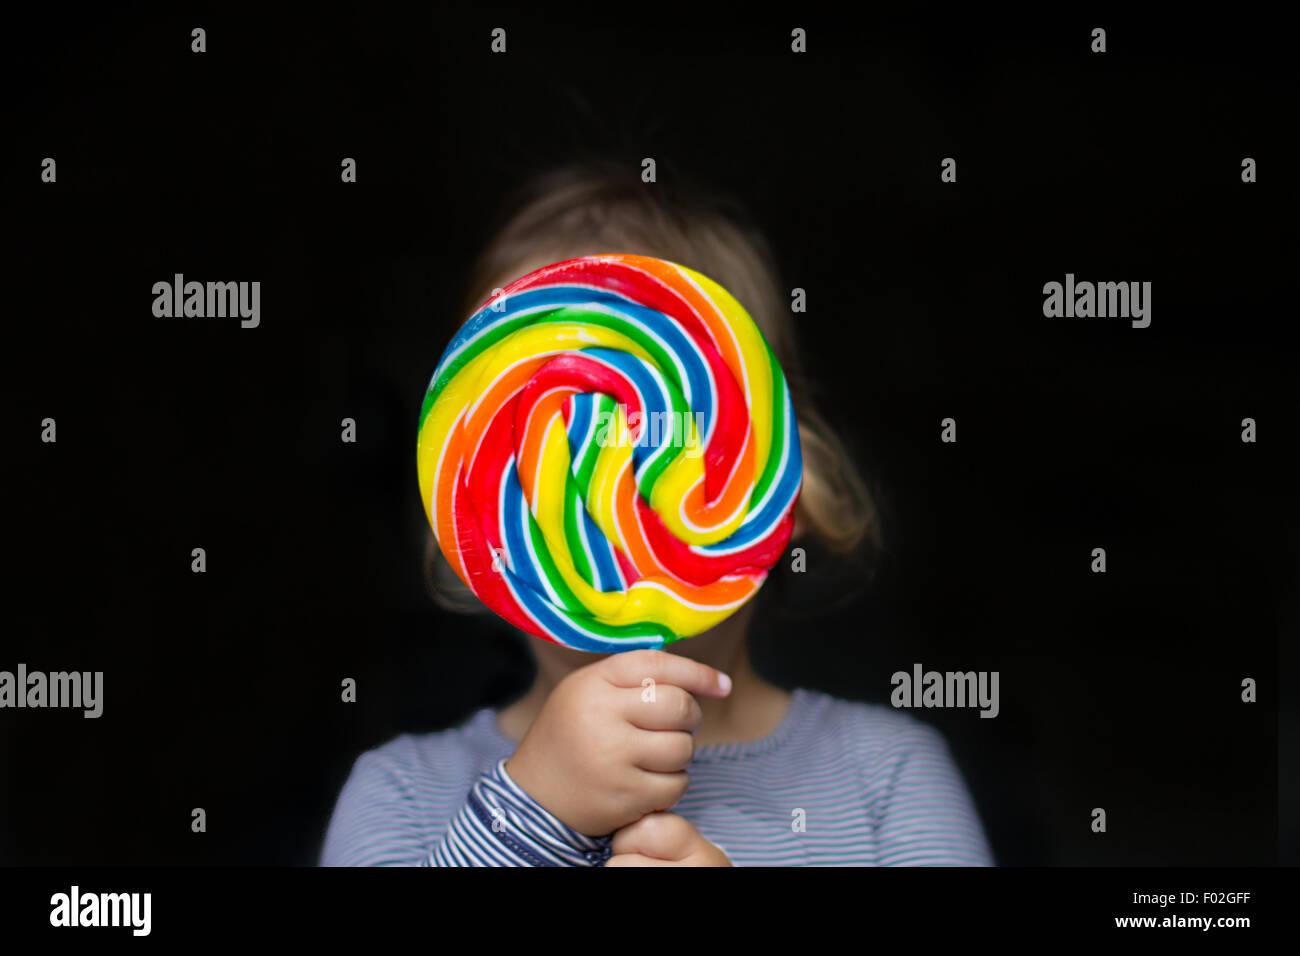 Porträt eines Mädchens hält einen bunten lollipop Stockbild